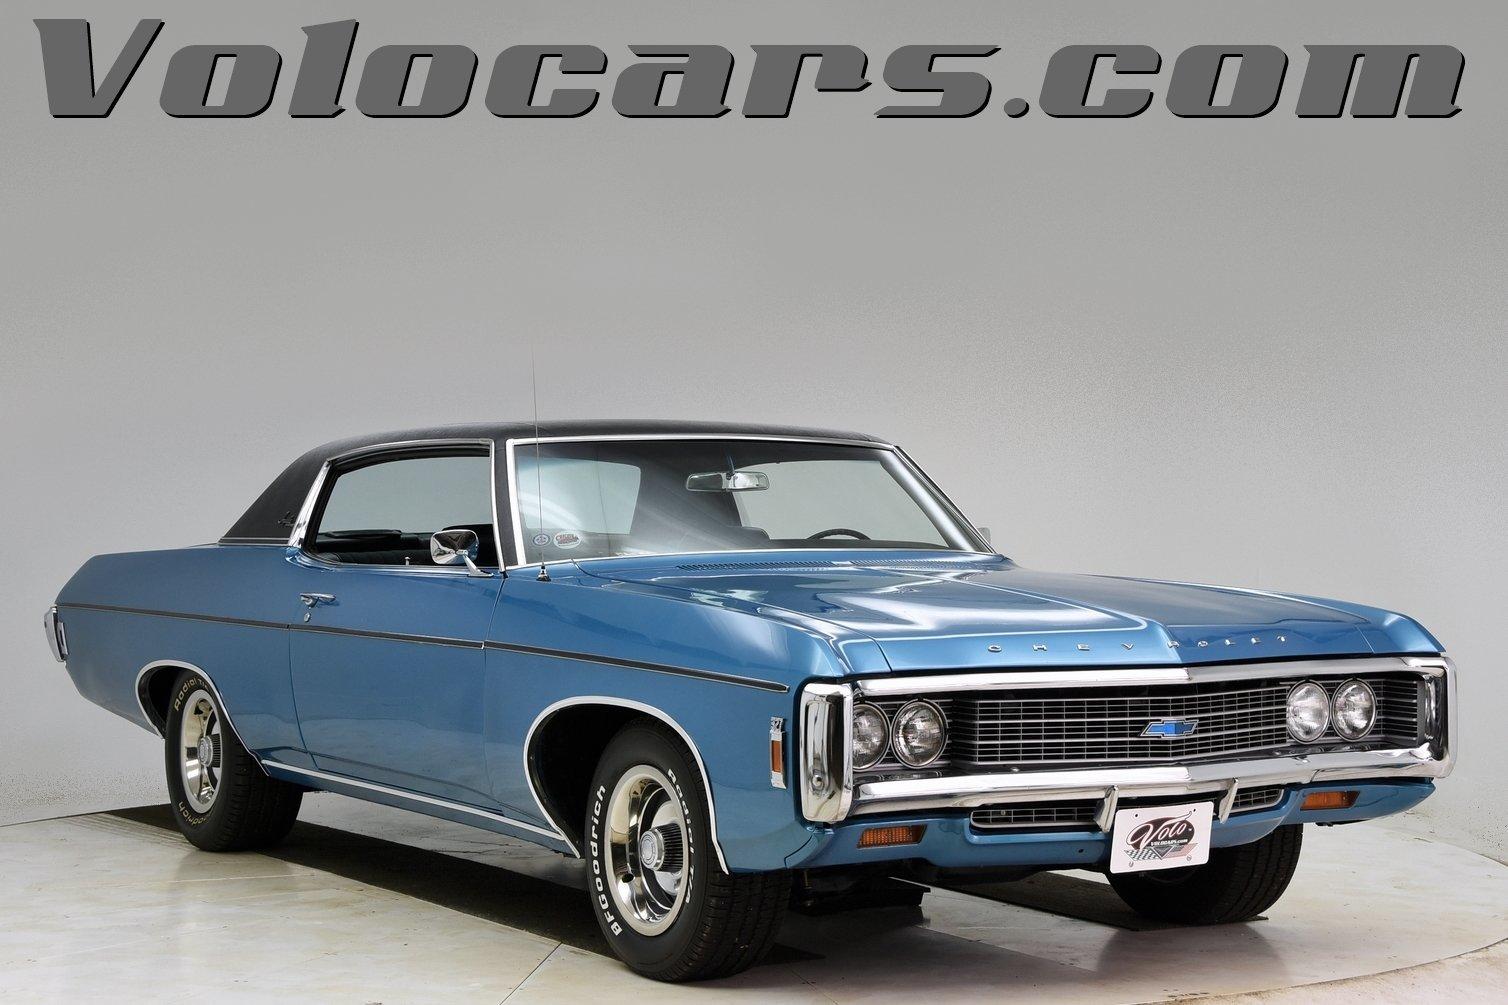 373038244a1a97 hd 1969 chevrolet impala